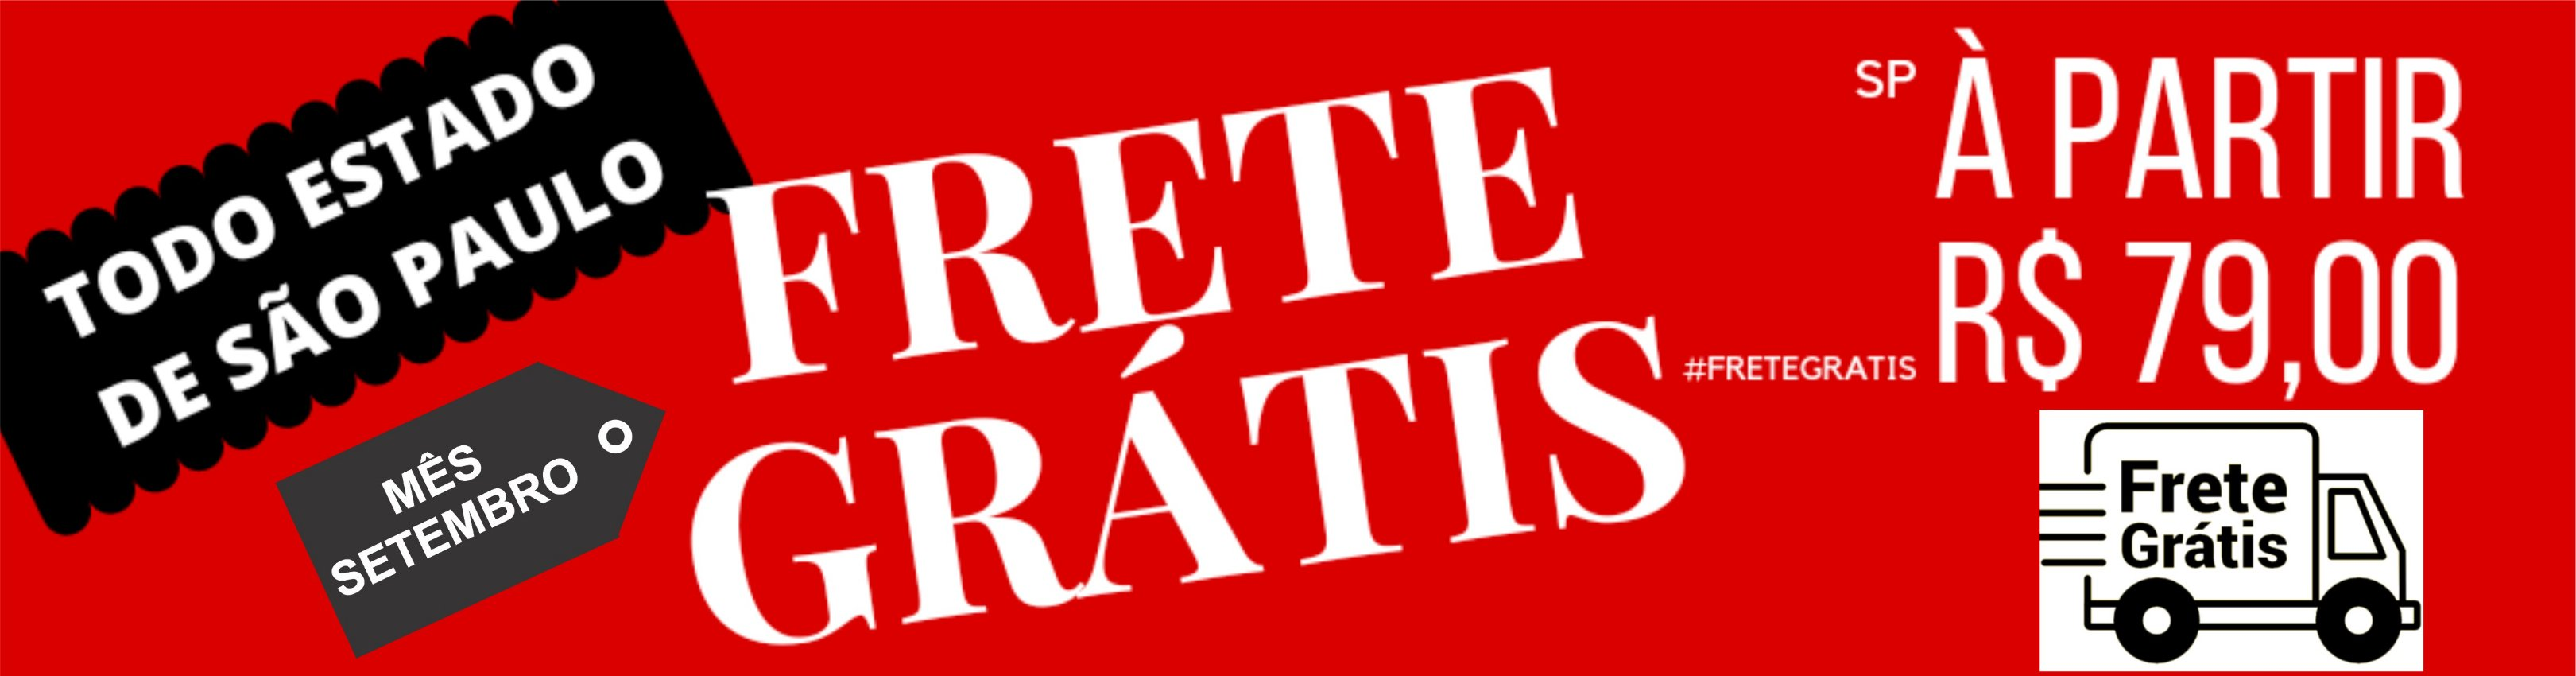 FRETE GRATIS SET